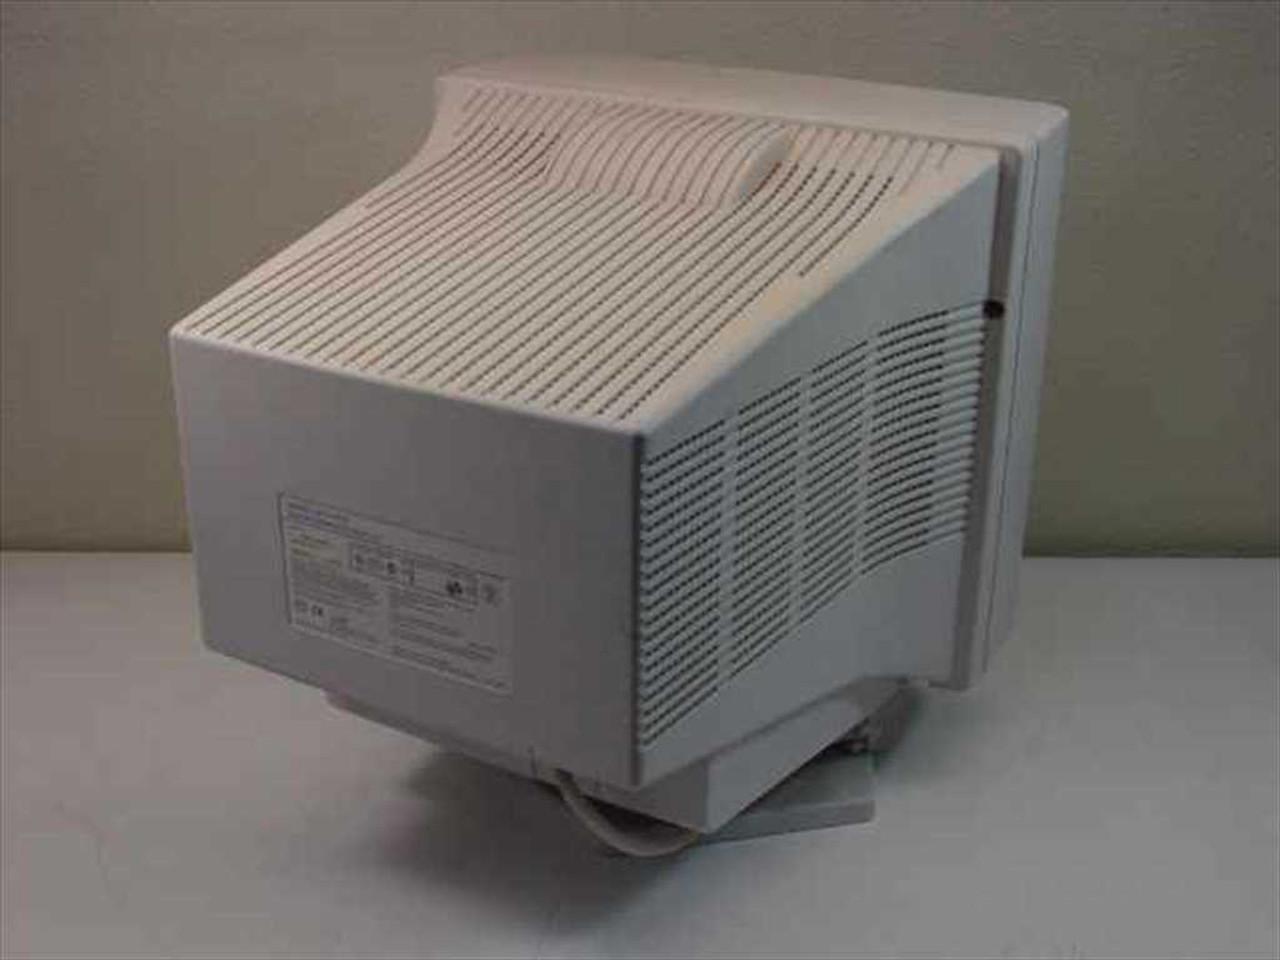 Gateway Cpd 17f23 Vivitron 17 Monitor 22155 W Stereo Power Amplifier Circuit Based On Ba5417